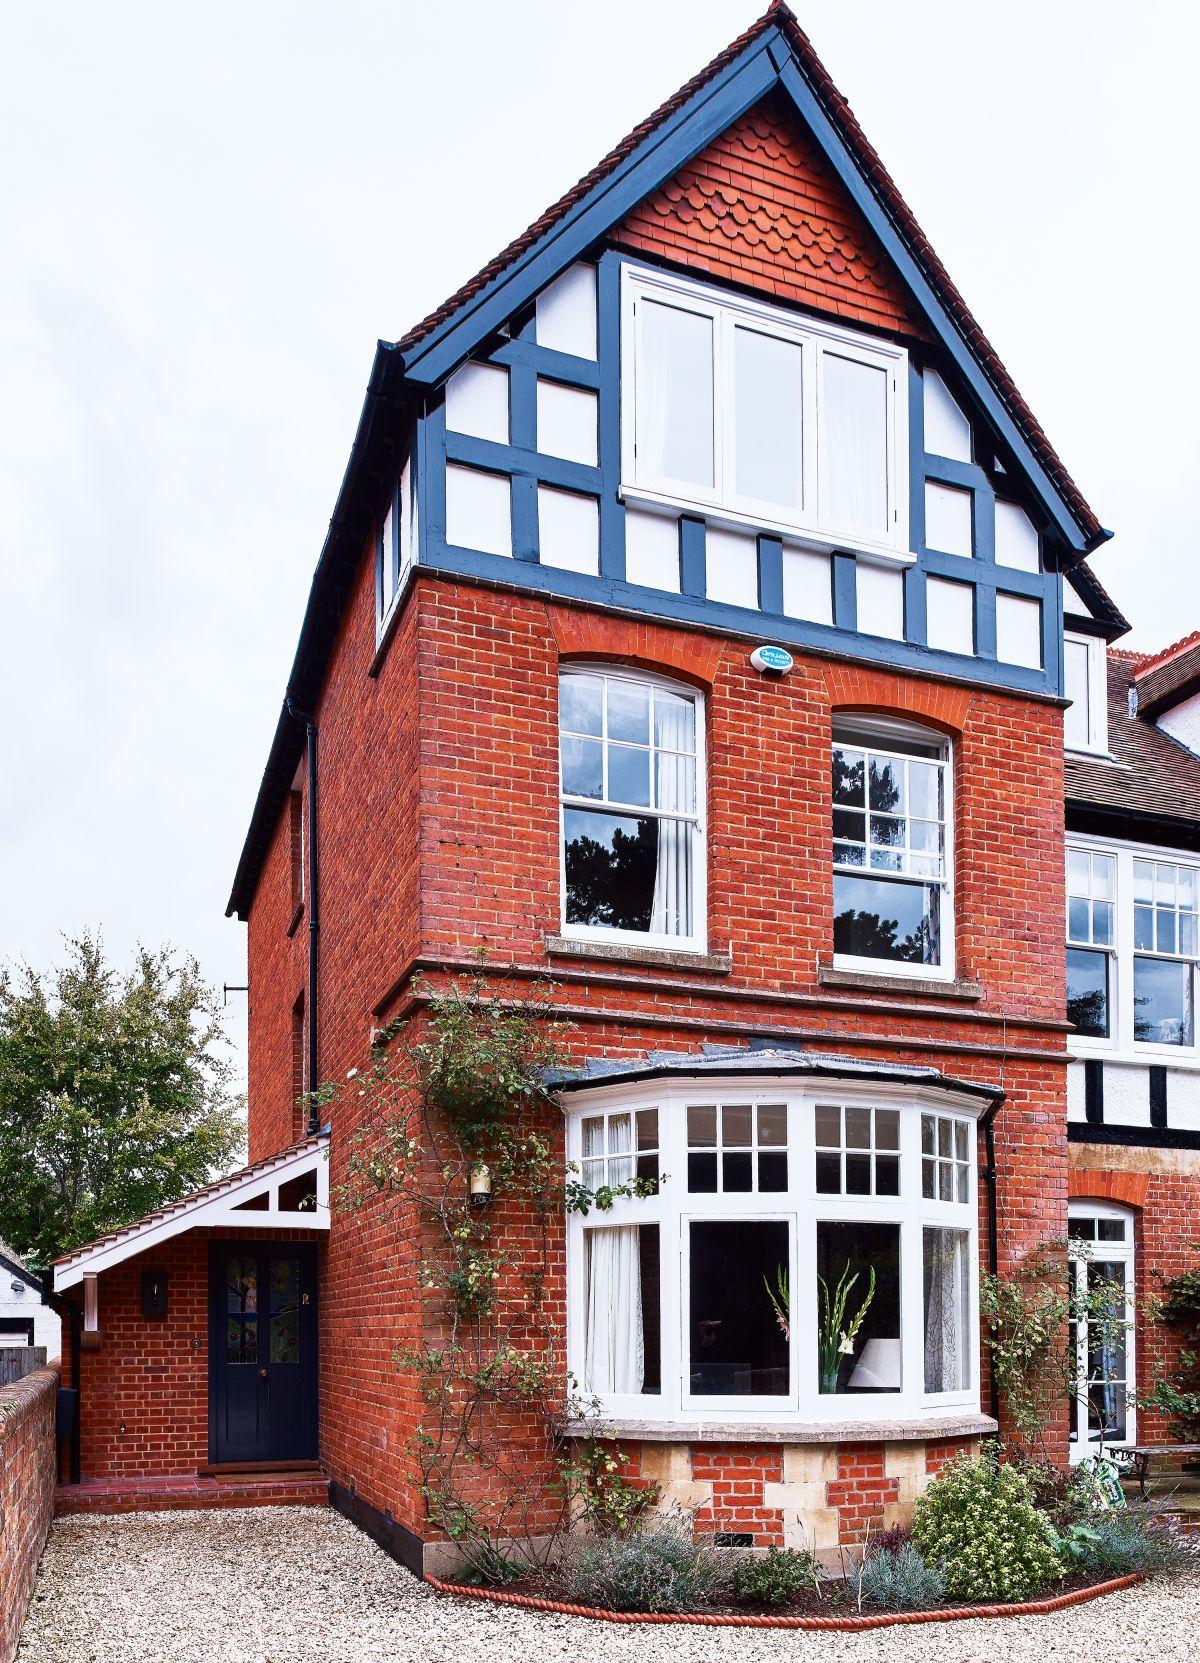 10 exterior home makeover ideas | Real Homes